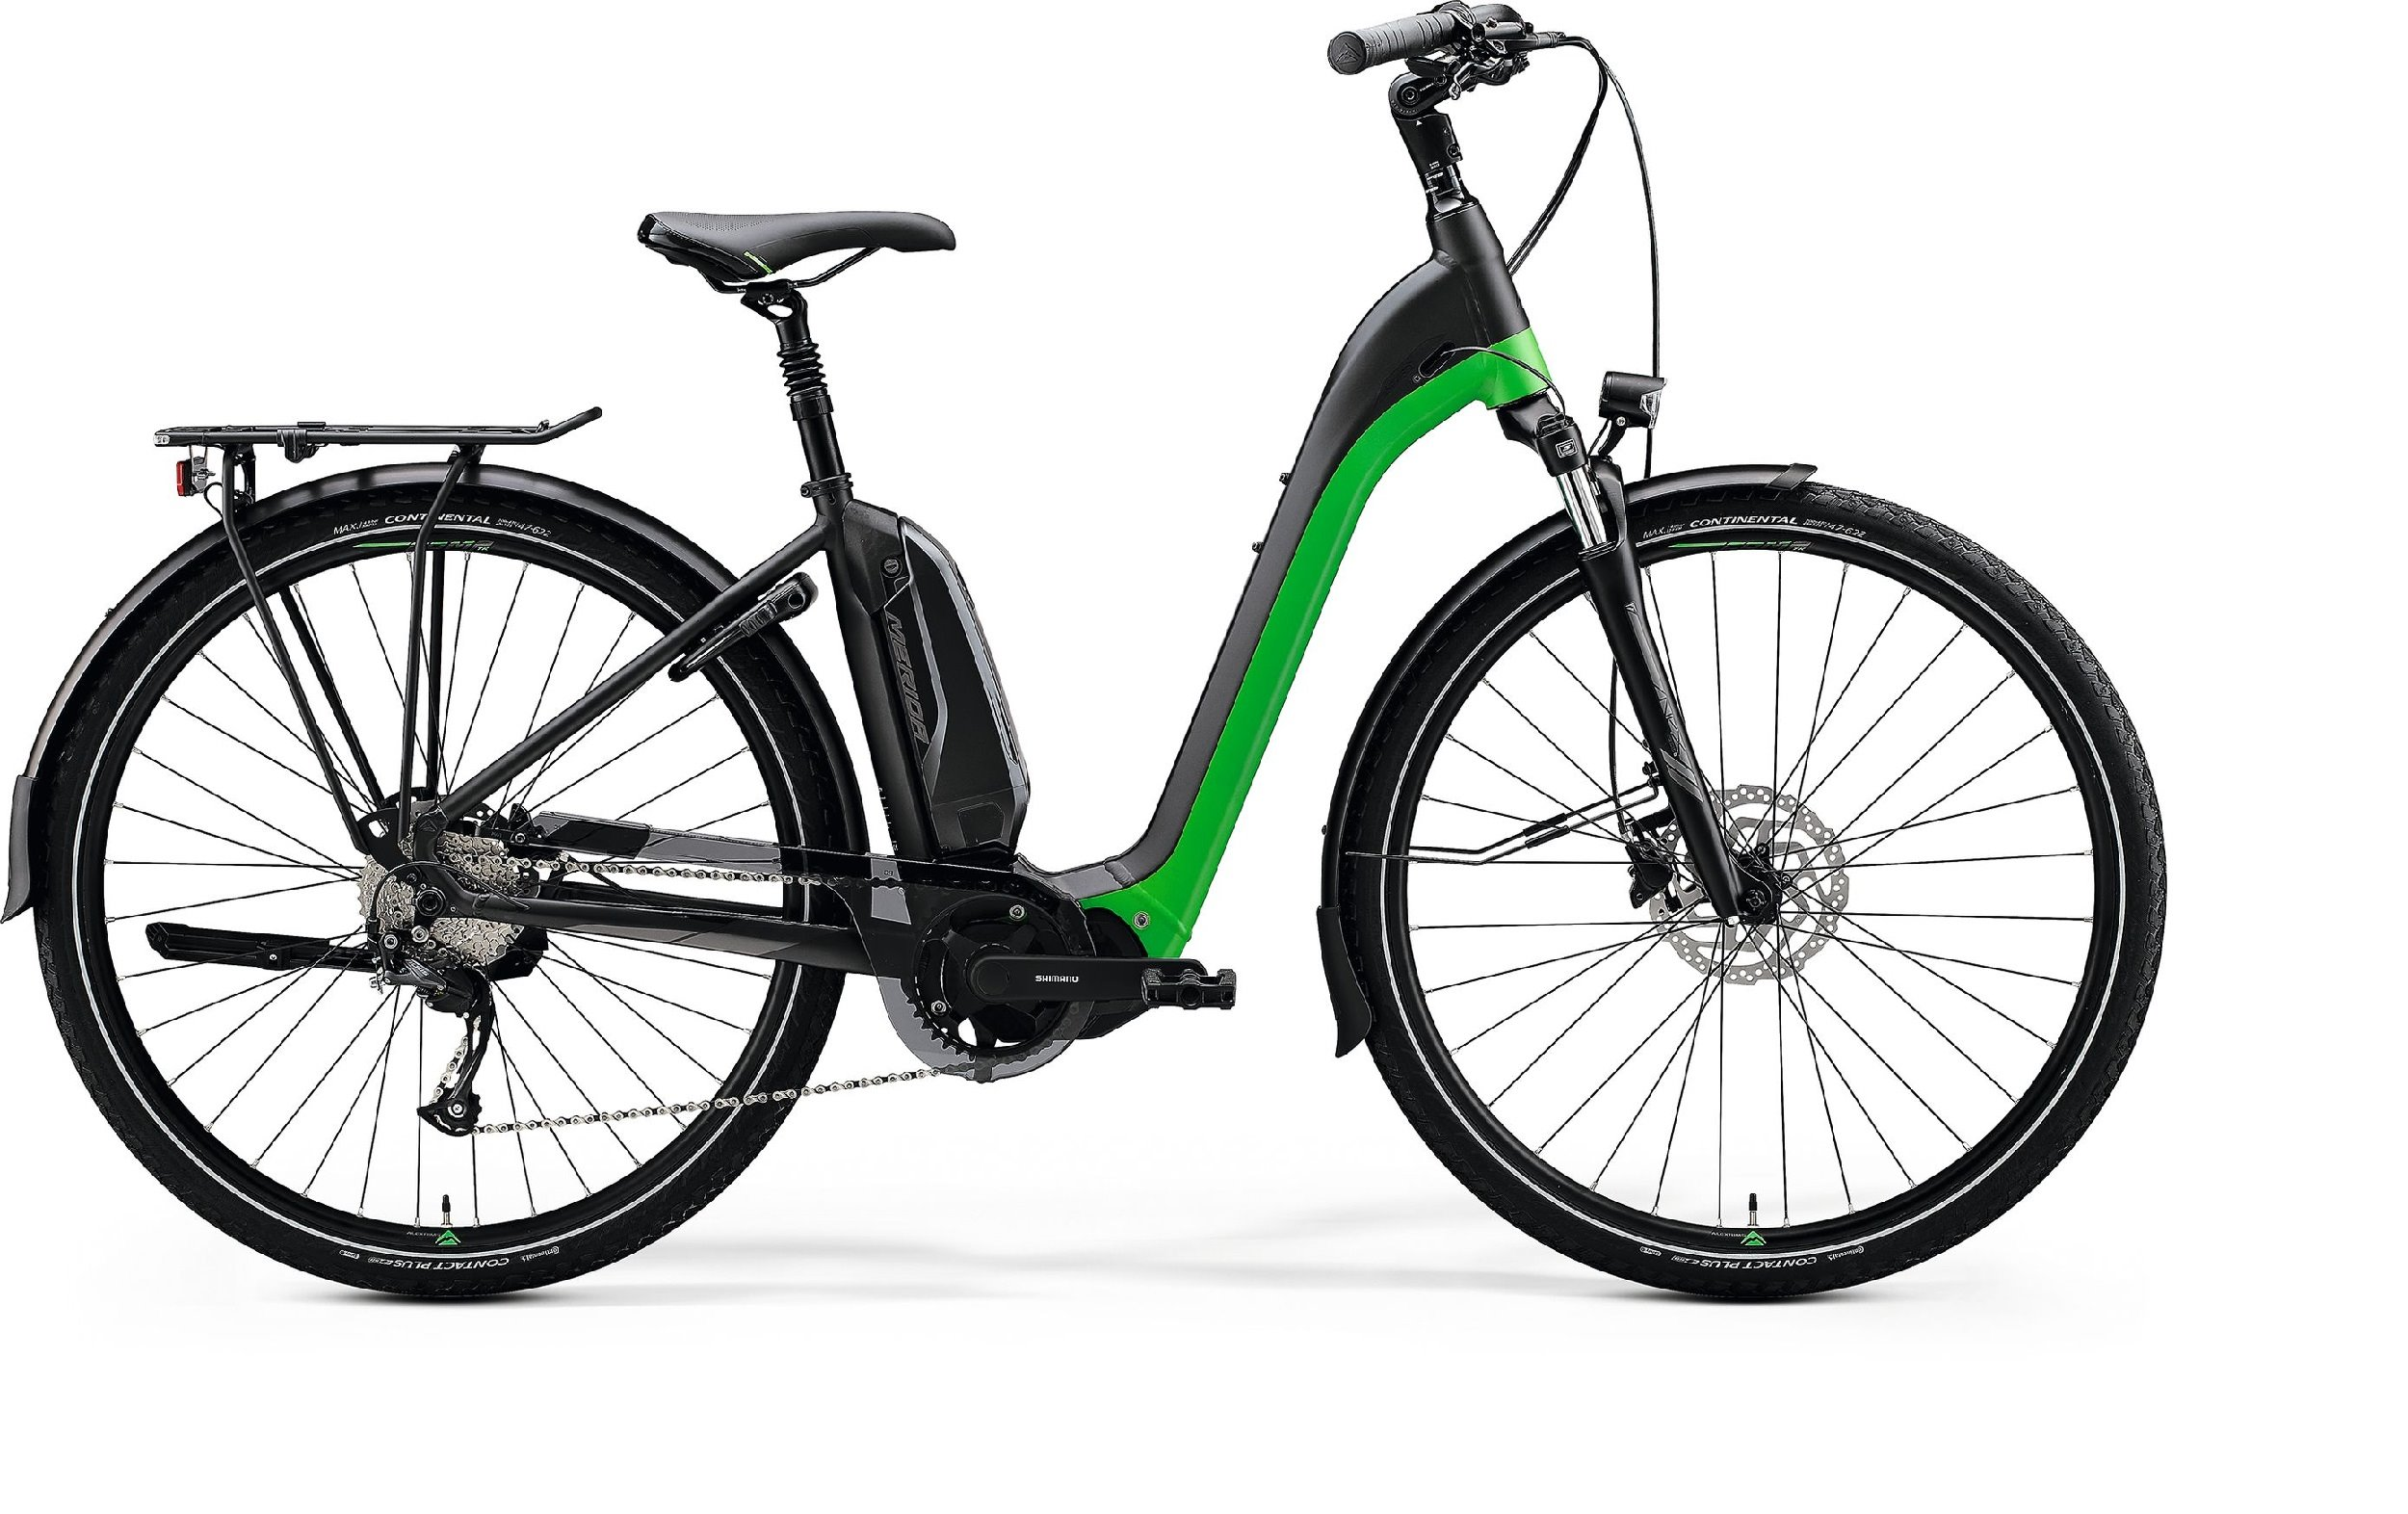 Merida eSPRESSO CITY 200 EQ černé/zelené (155-165 cm)